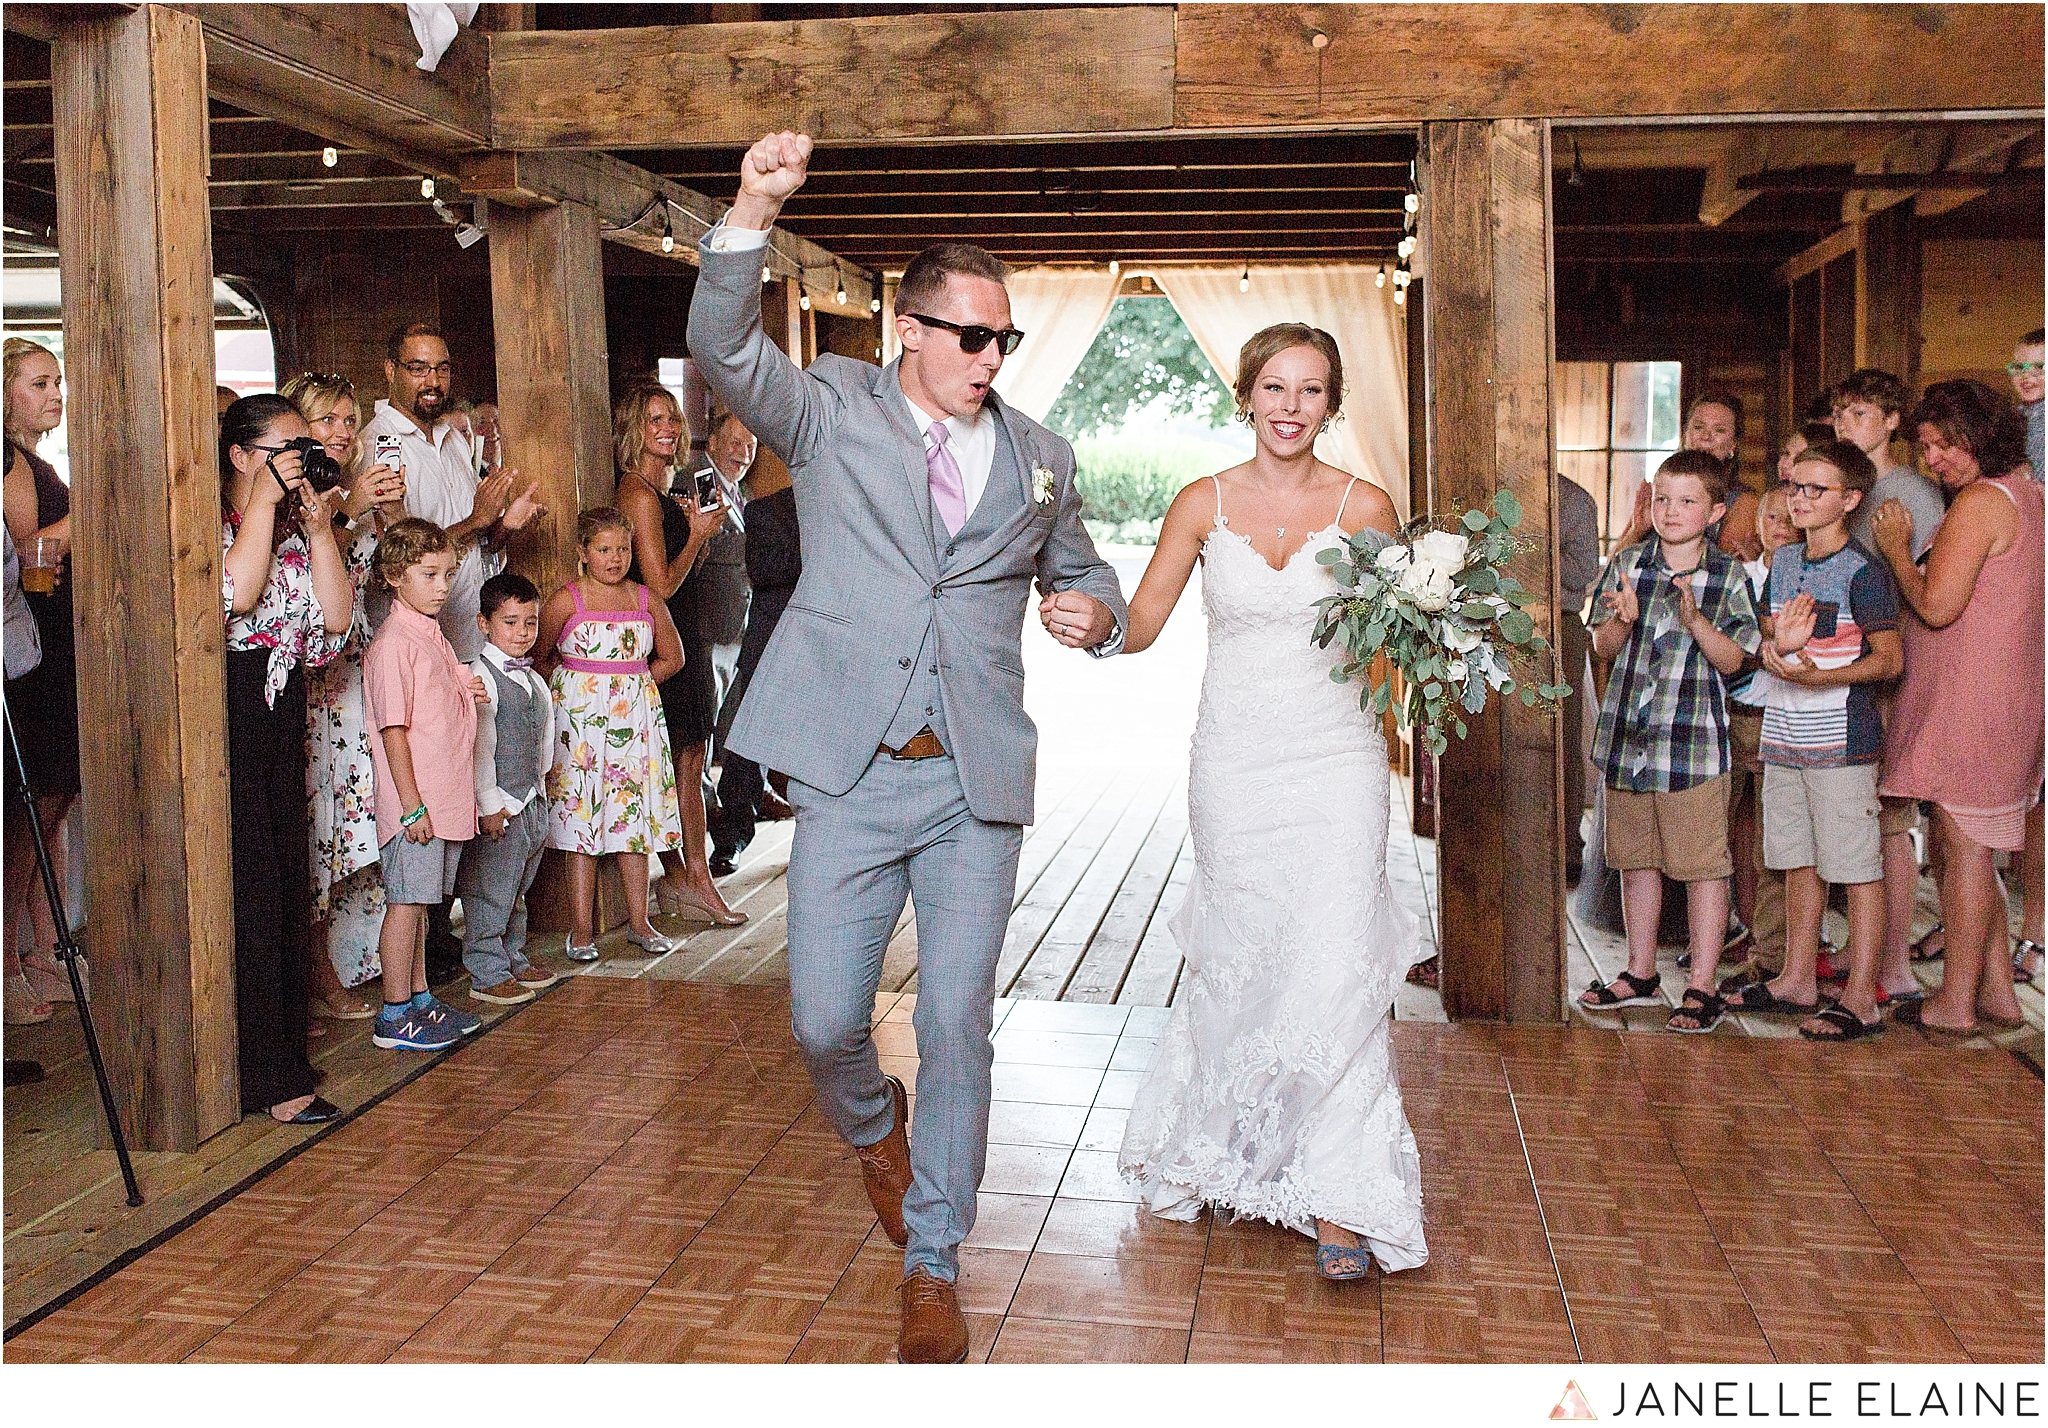 warnsholz-wedding-michigan-photography-janelle elaine photography-183.jpg